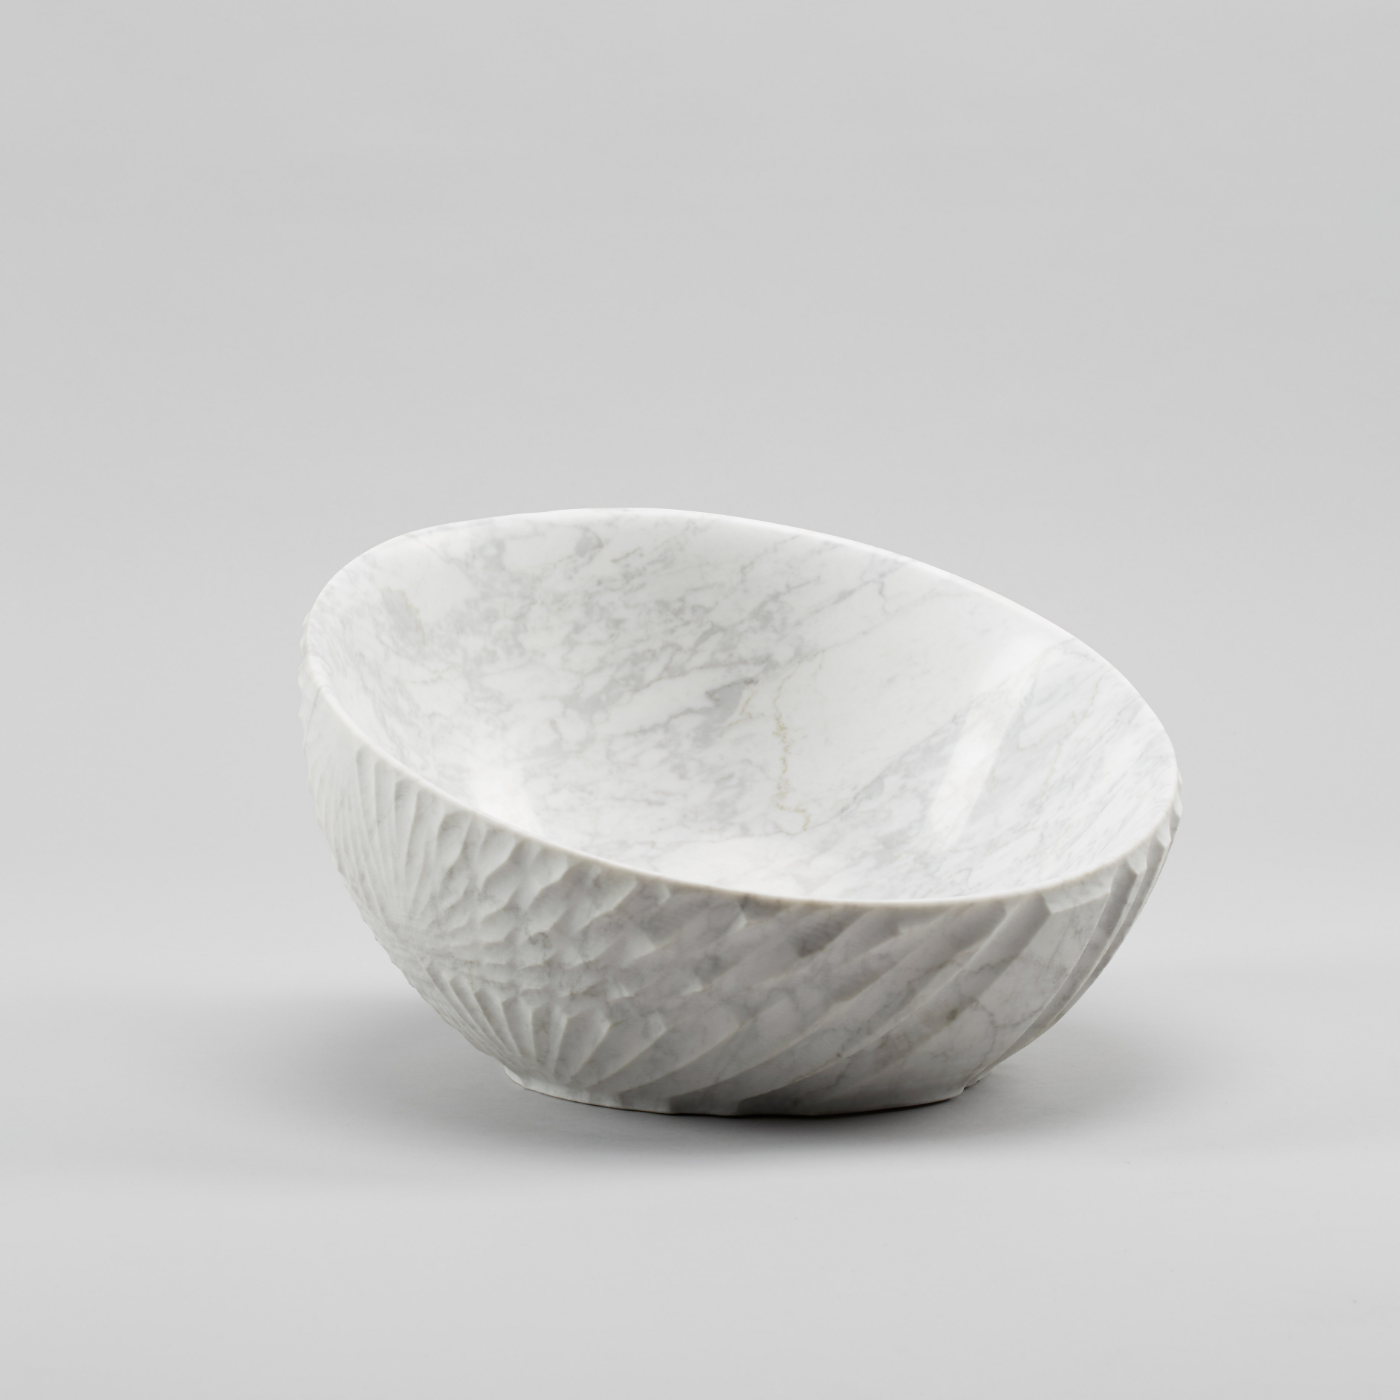 Lapicida_Erosion-Bowl_Carrara